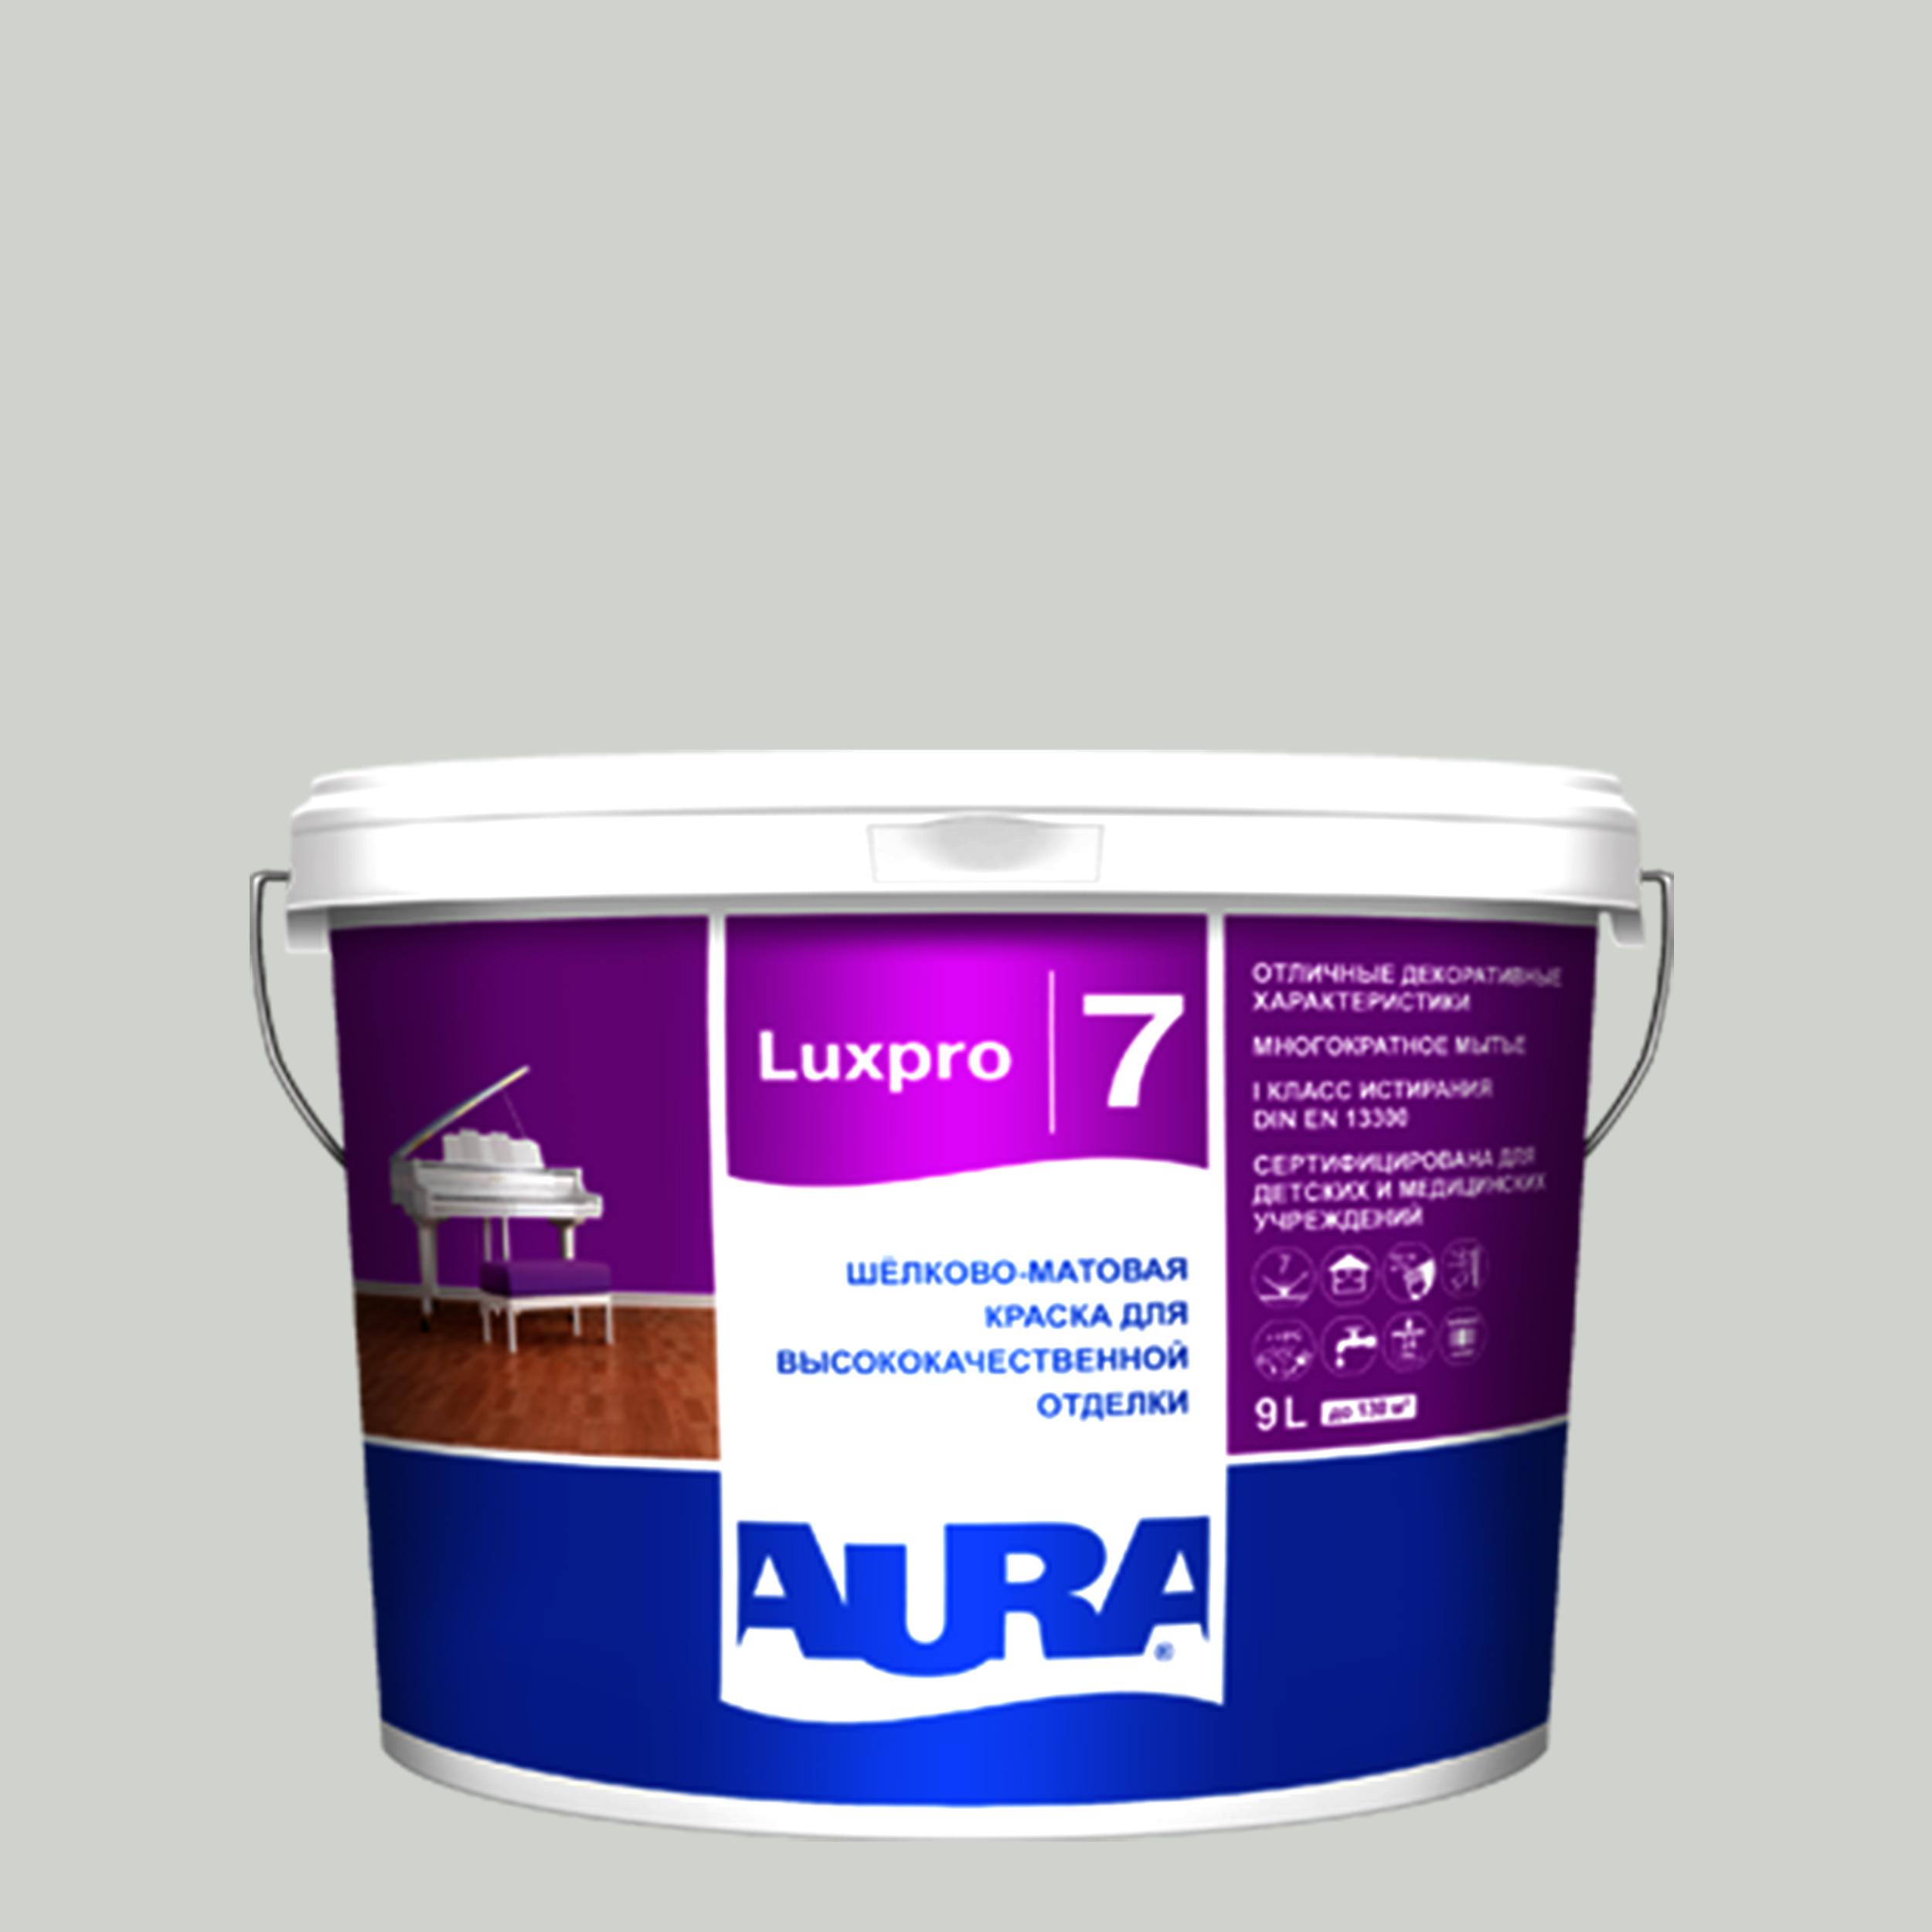 Фото 4 - Краска интерьерная, Aura LuxPRO 7, RAL 8004, 11 кг.